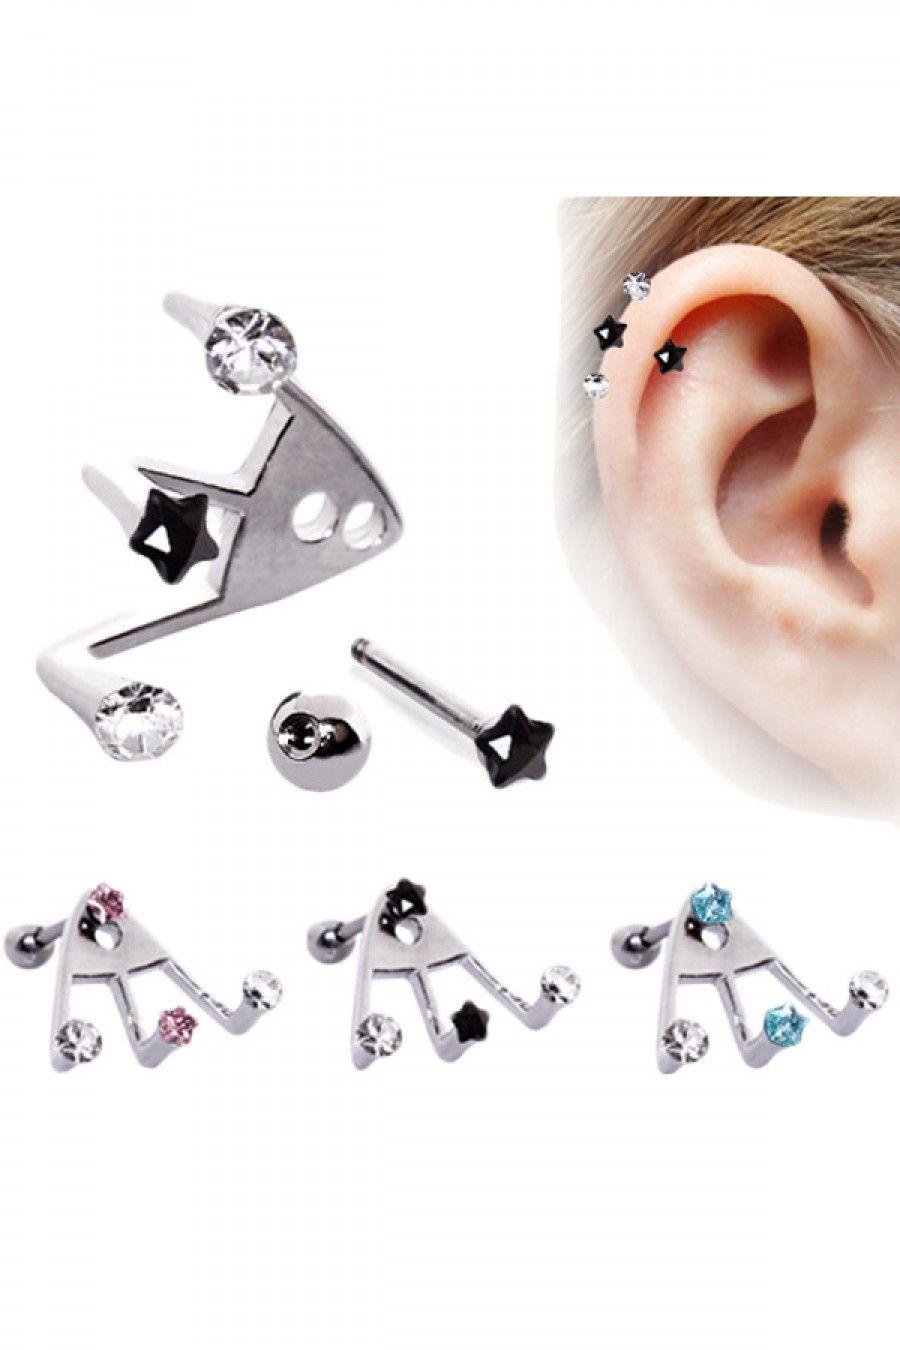 Earlobe piercing bump  L Surgical Steel Trident Triple Star u Round CZ Cartilage Earring